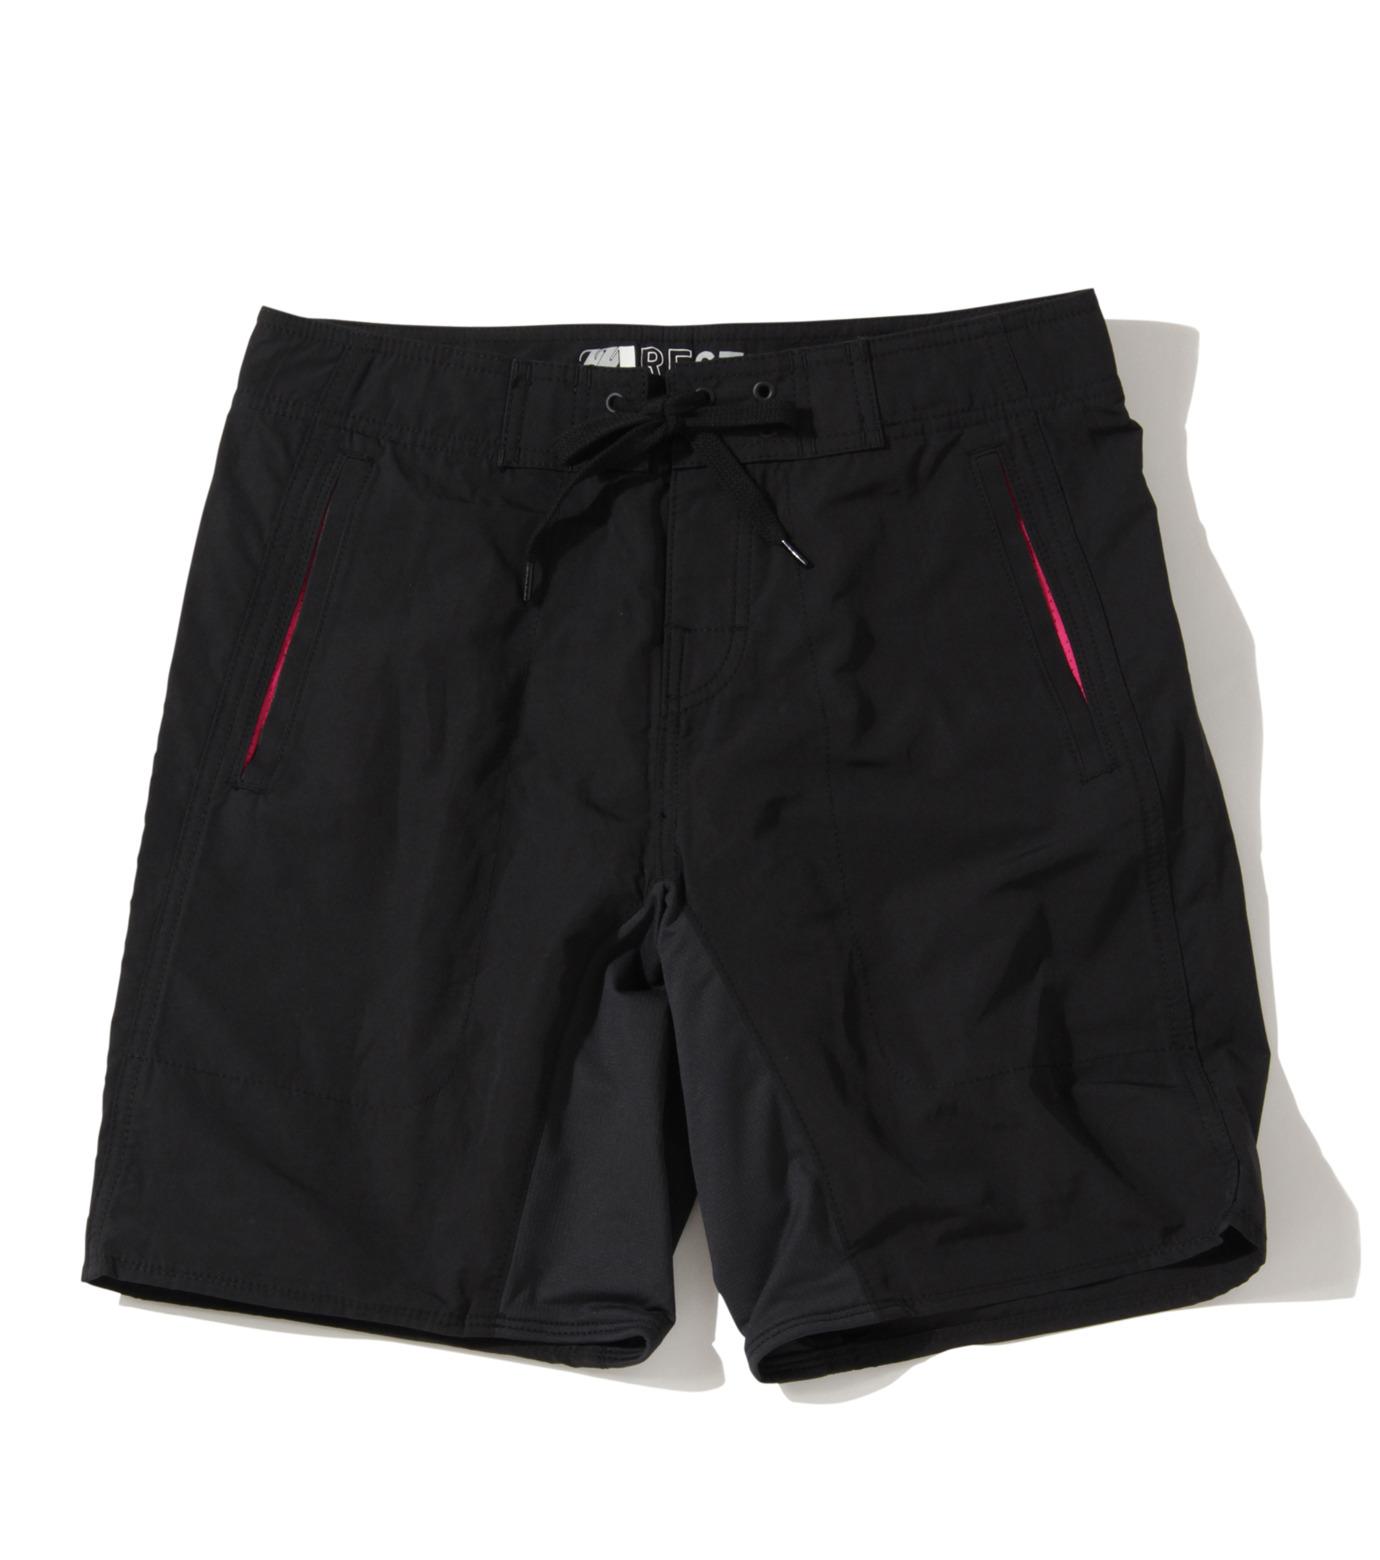 TWO TWO ONE(トゥートゥーワン)のSurf shorts short-BLACK(SWIMWEAR/SWIMWEAR)-15N948001-13 拡大詳細画像1